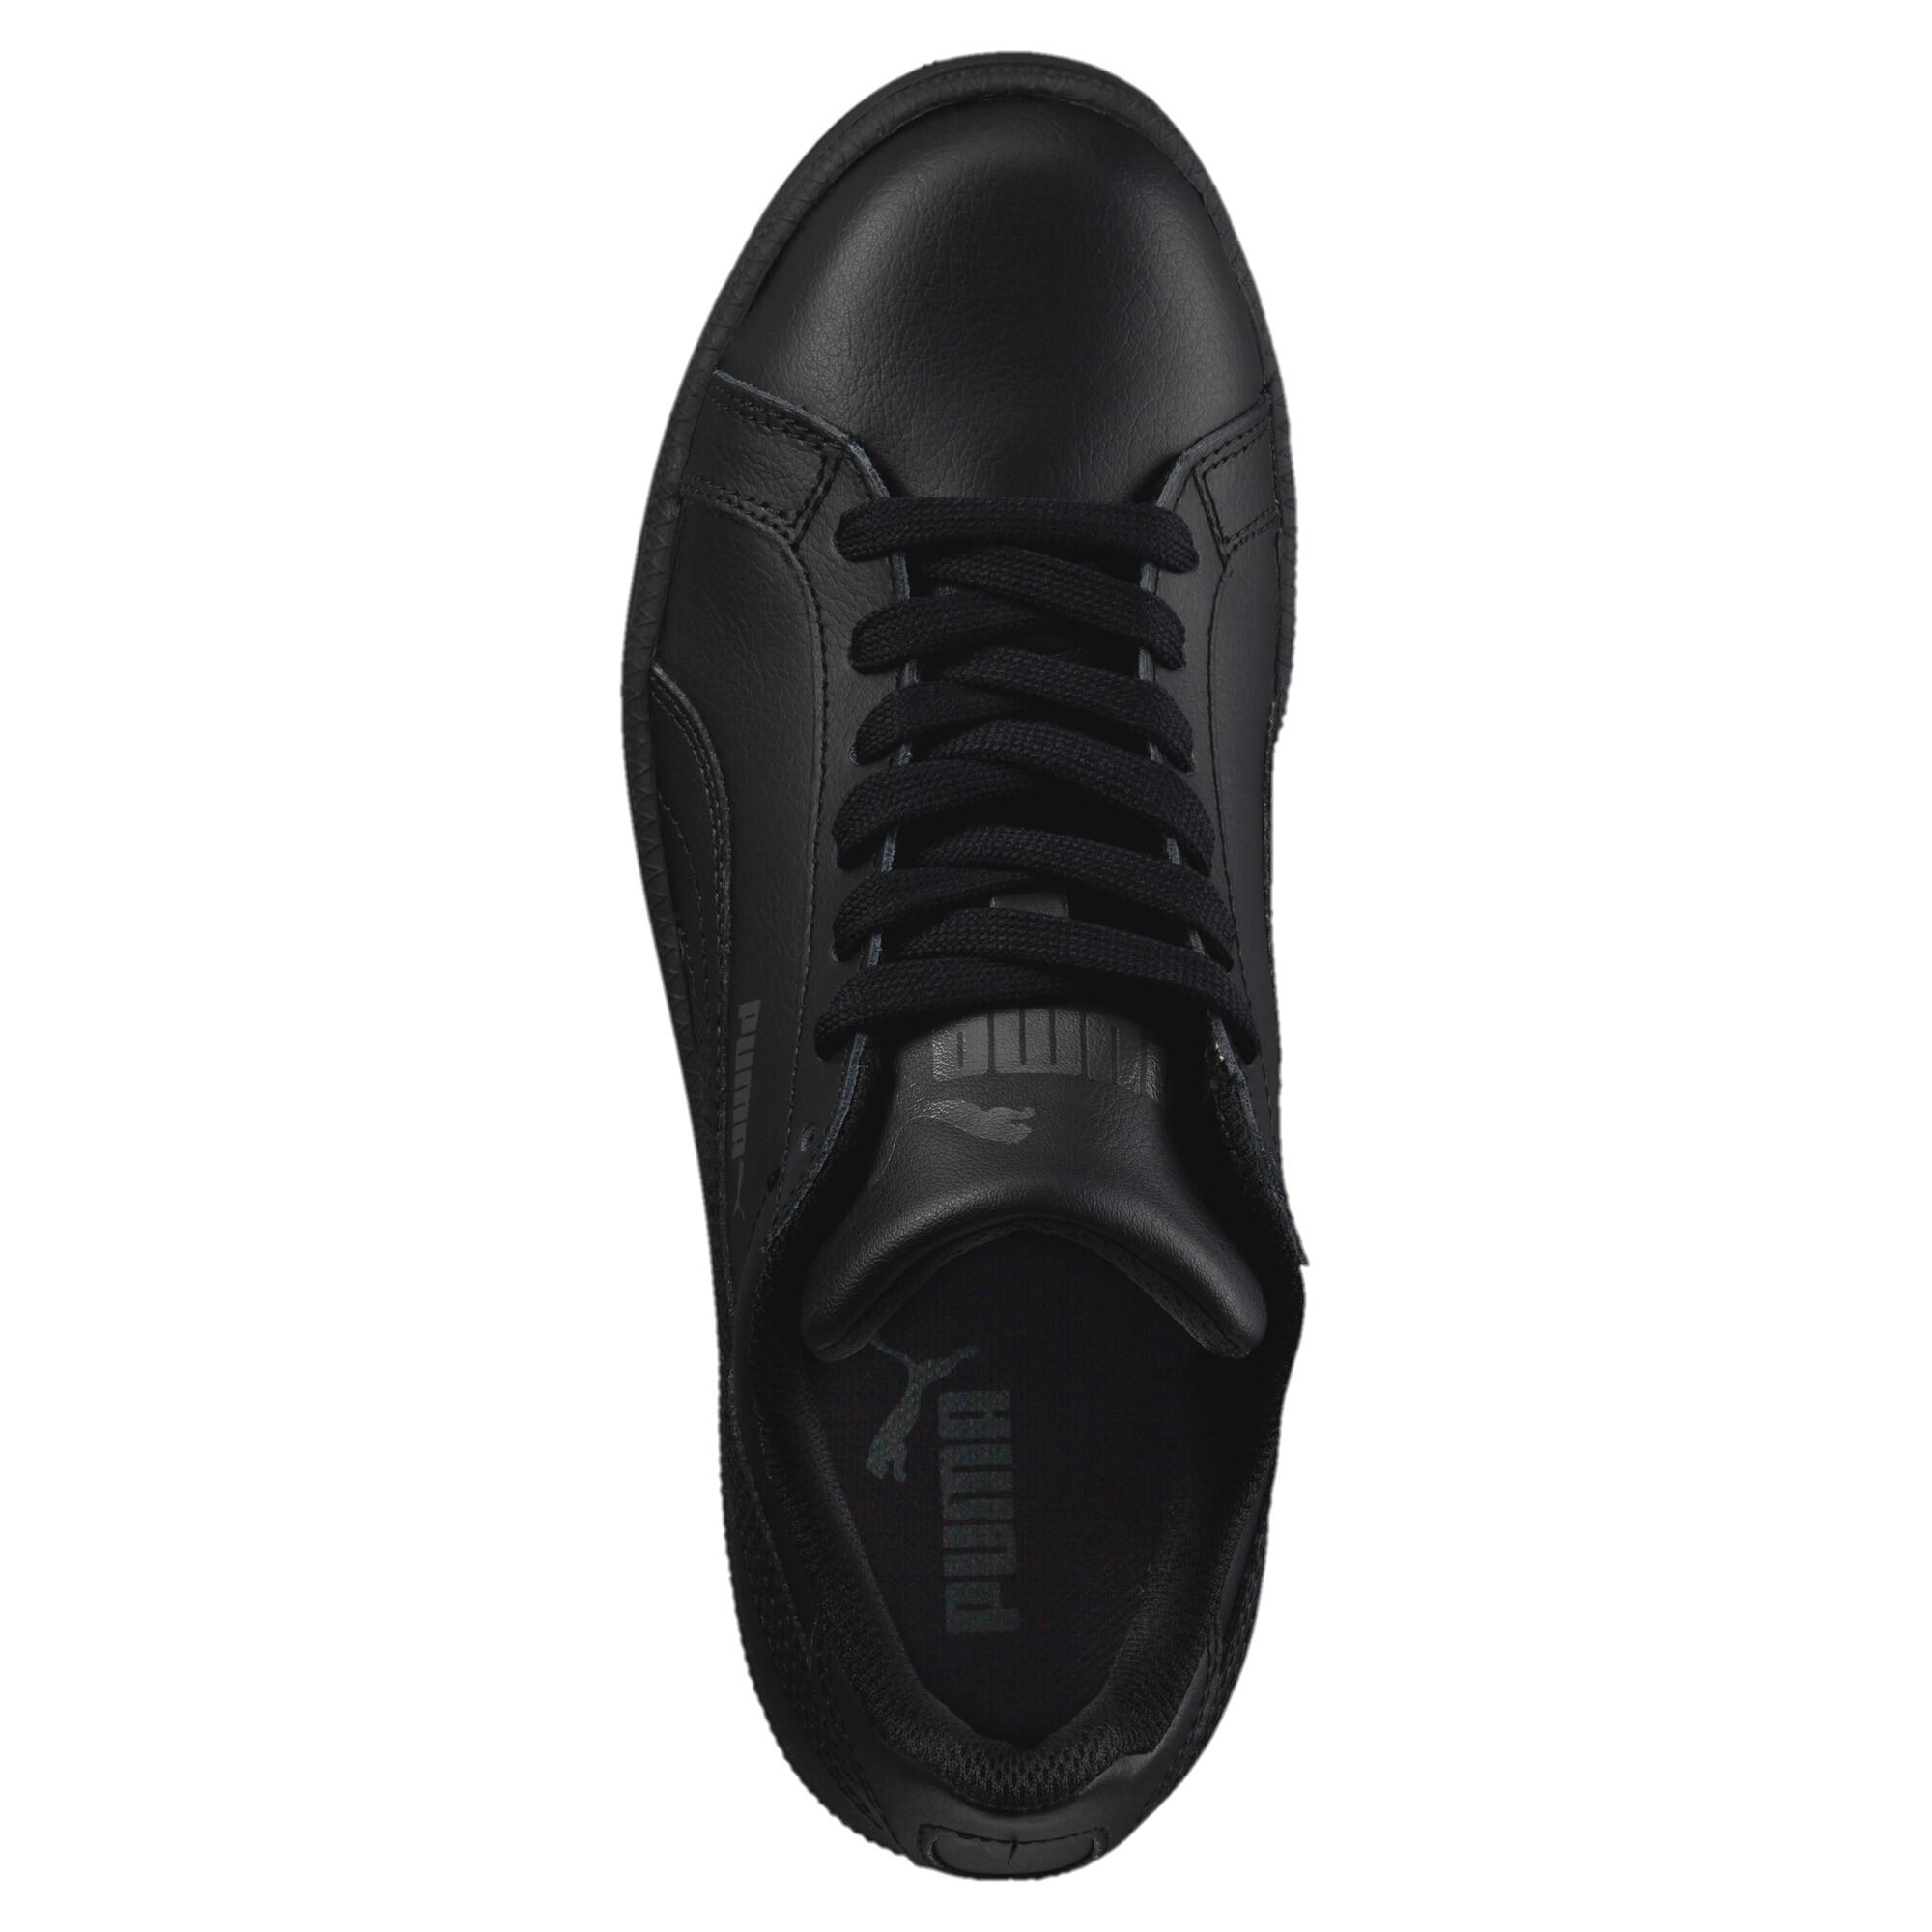 PUMA-Smash-Jr-Sneaker-Unisex-Schuhe-Kinder-Neu Indexbild 6